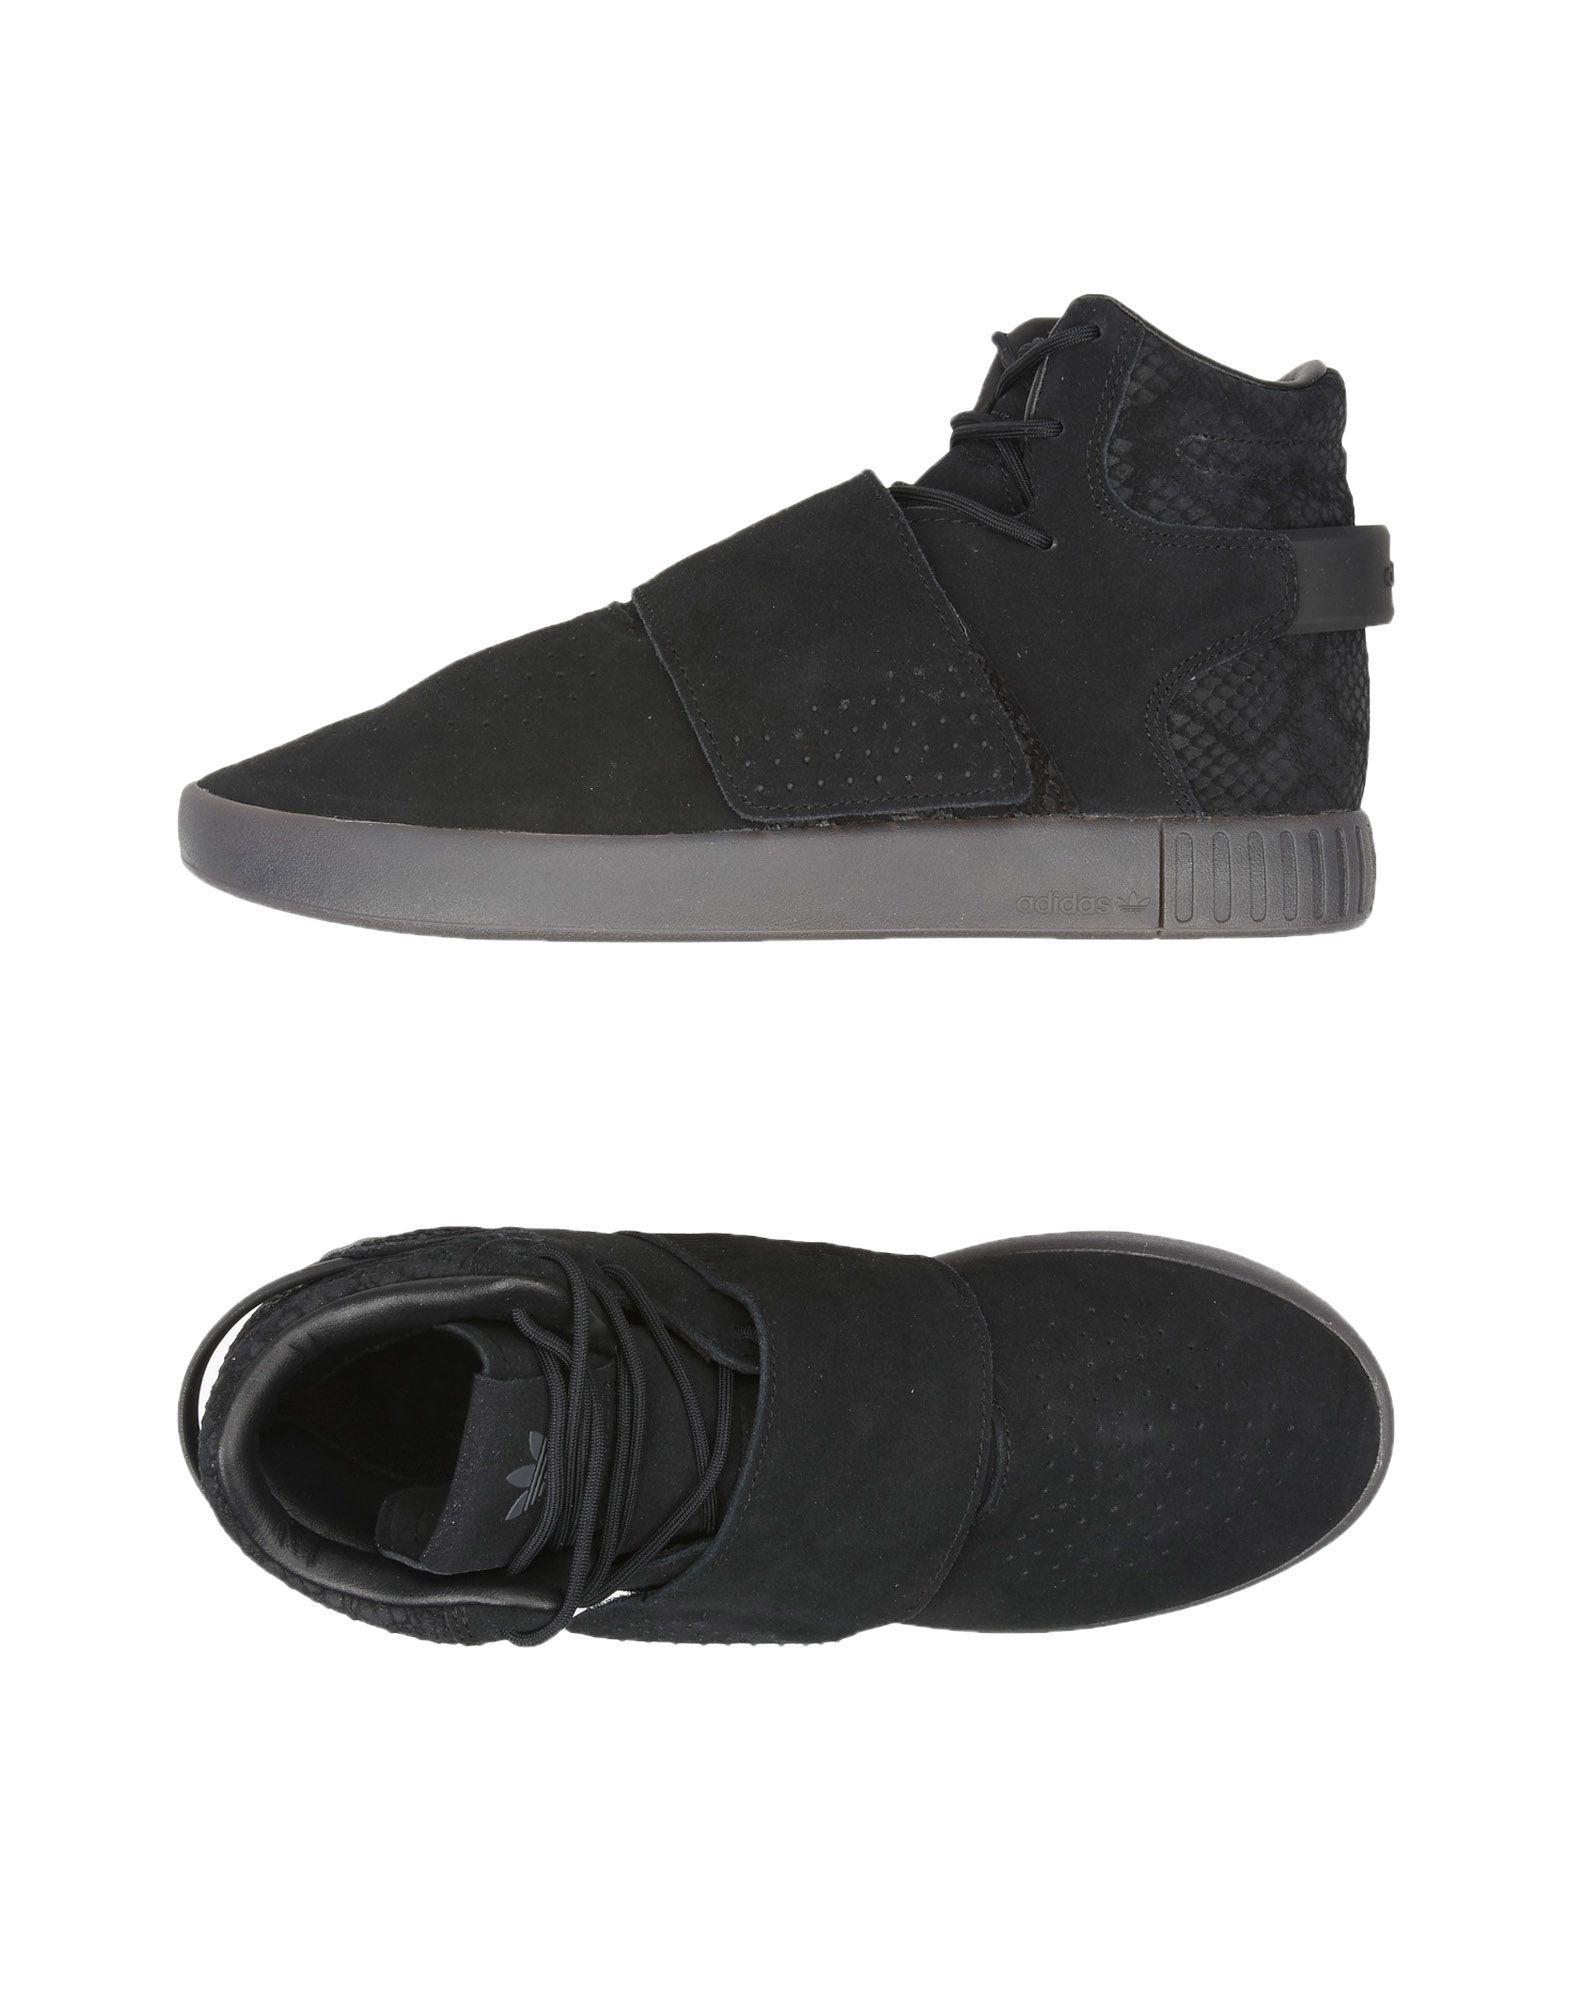 Rabatt echte Schuhe Adidas Originals Tubular Invader Str  11215684XG